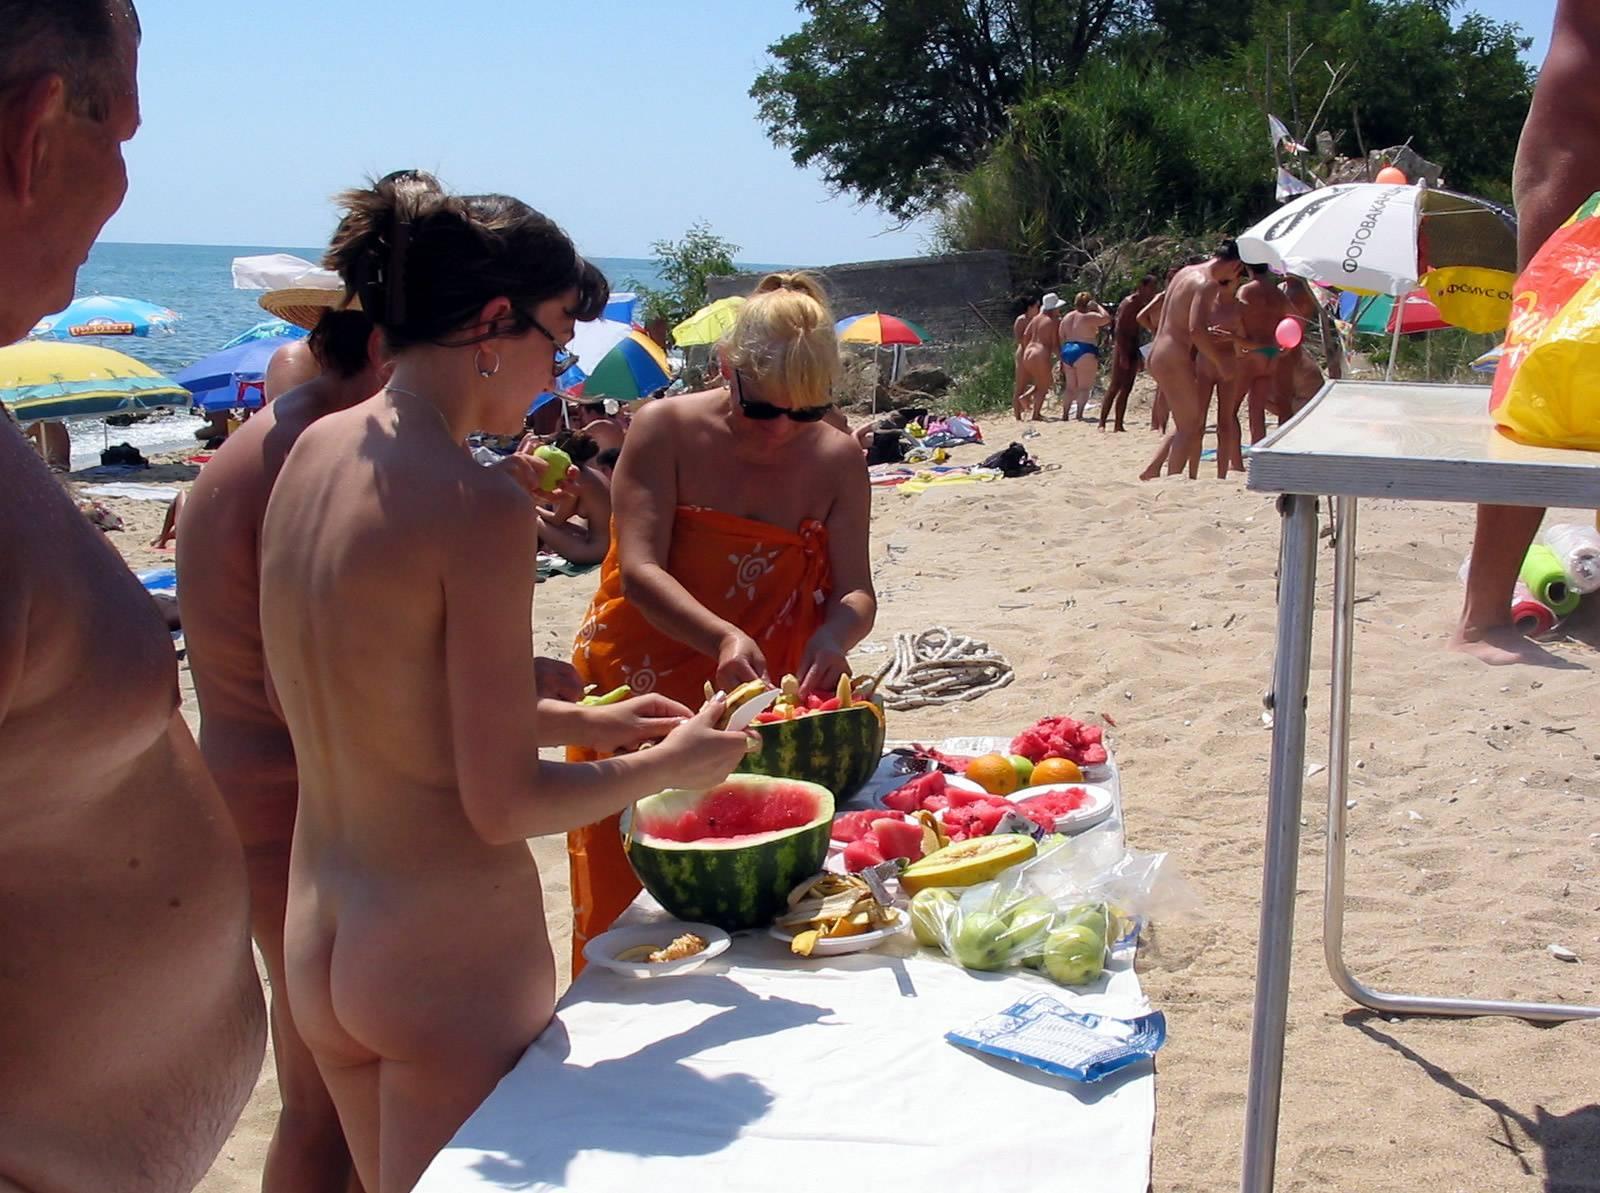 Bulgarian Nude Day Preps - 1